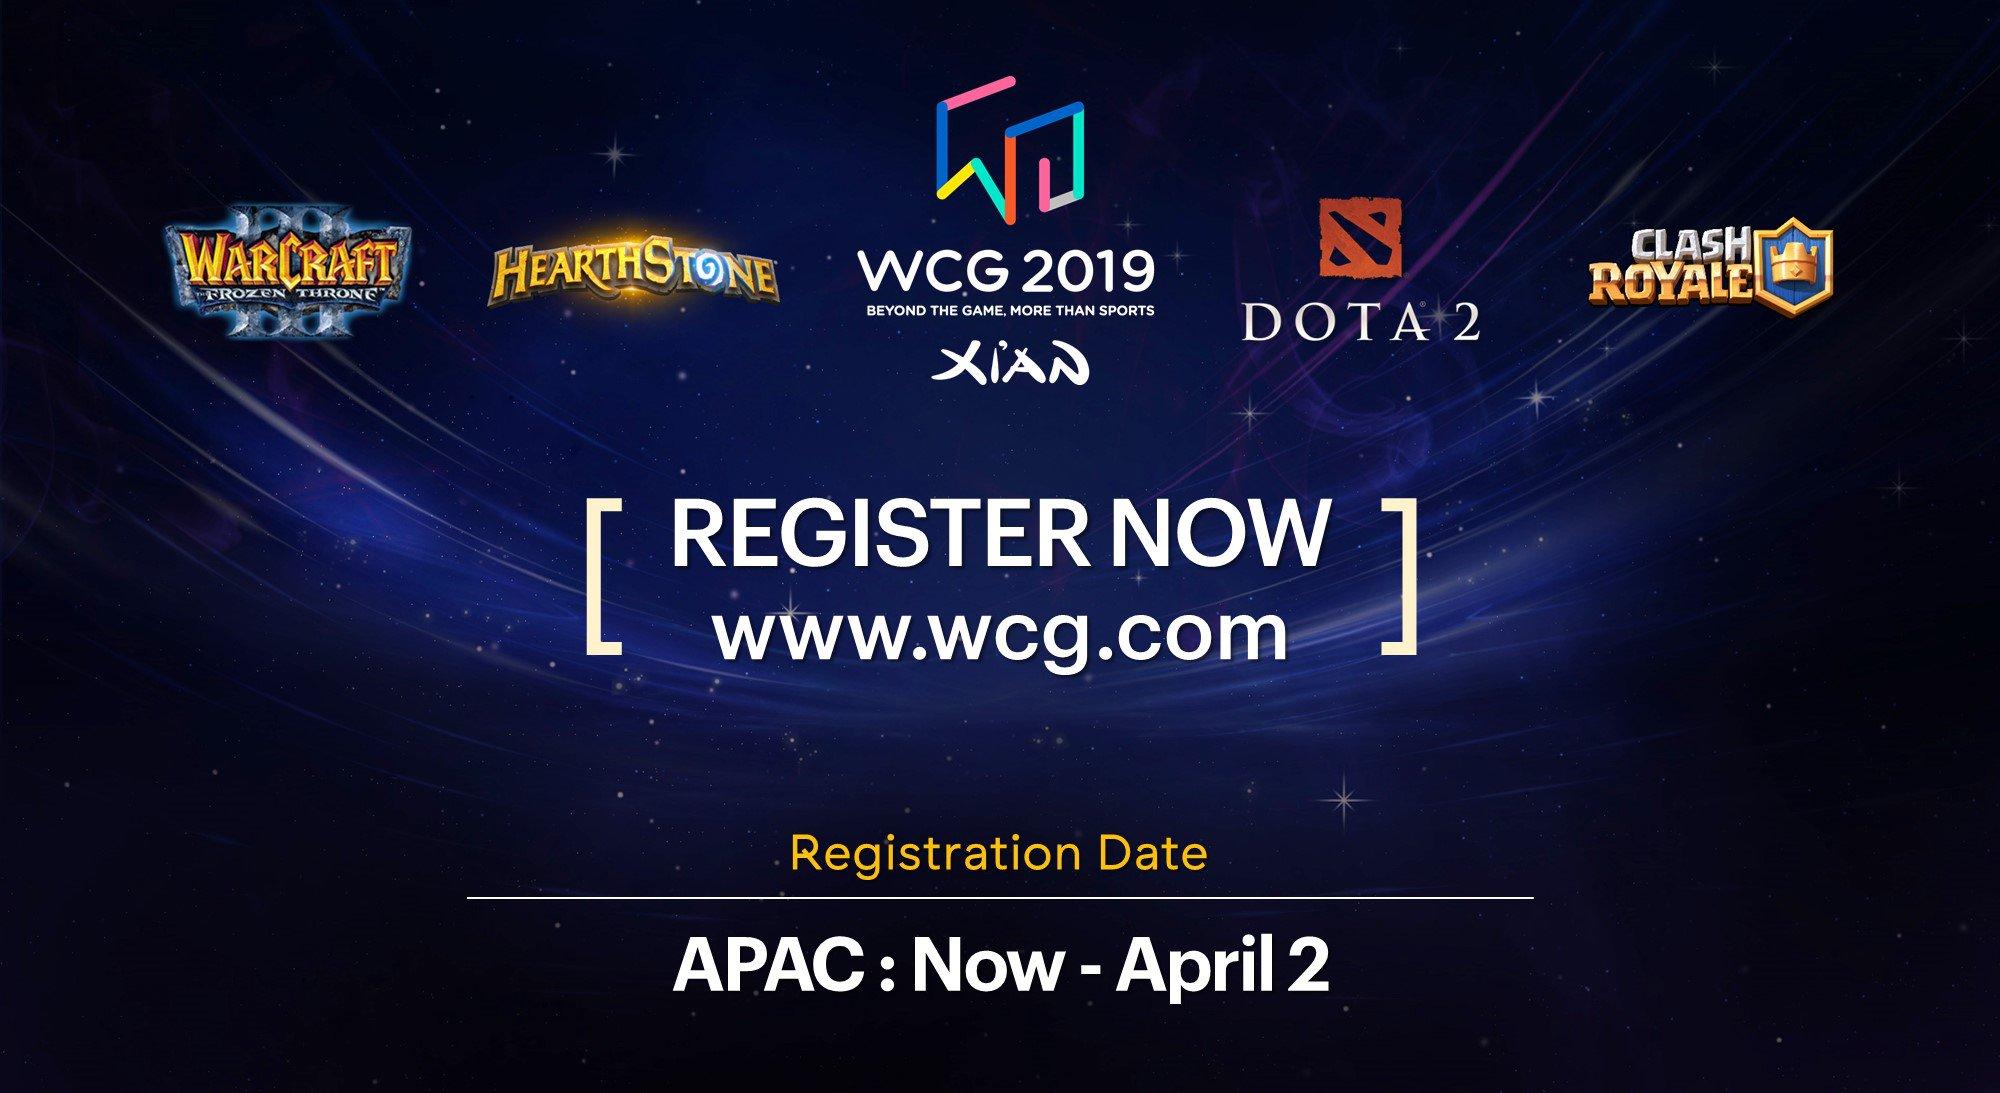 eGG | World Cyber Games Extends Registration Period